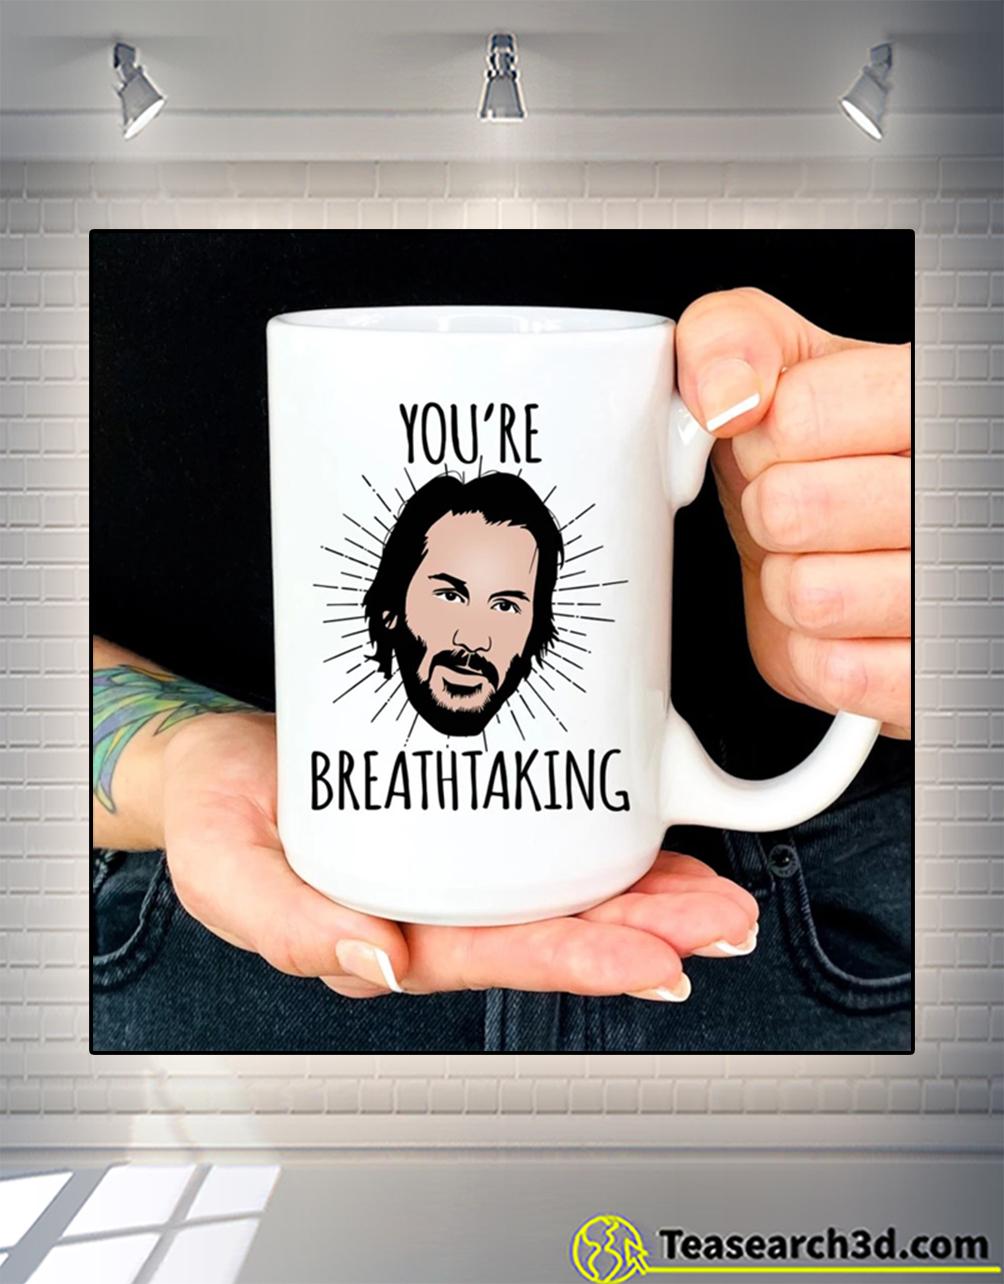 Keanu reeves you're breathtaking mug